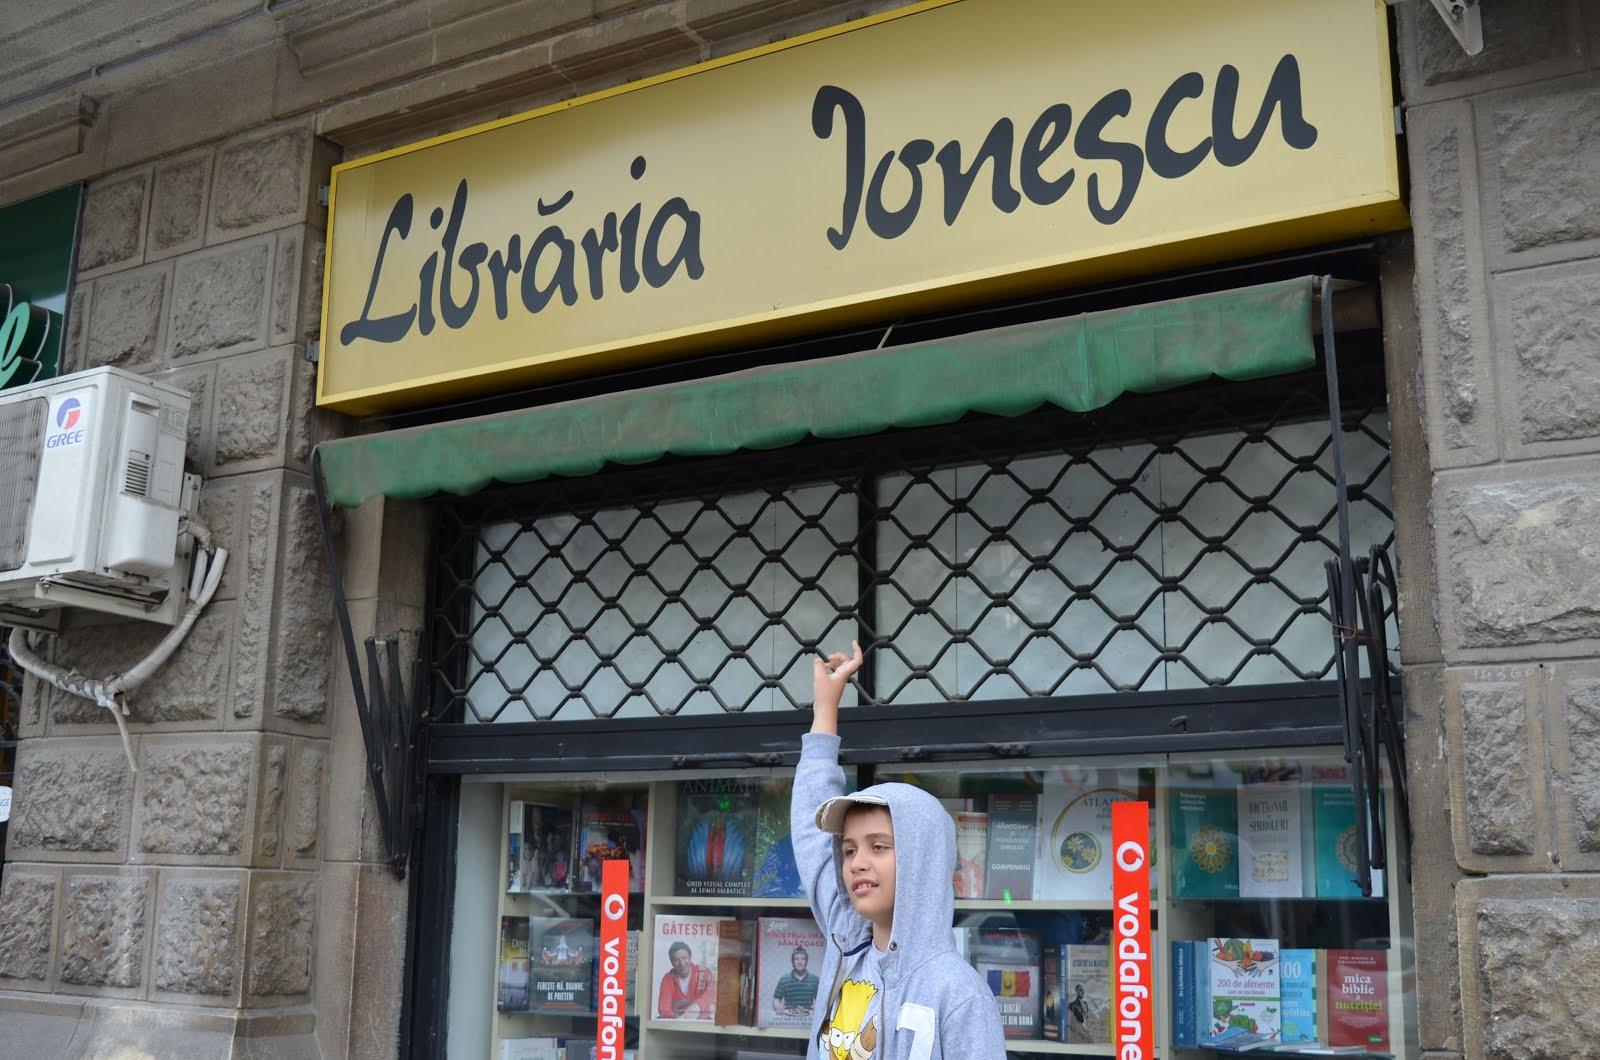 Libraria Ionescu